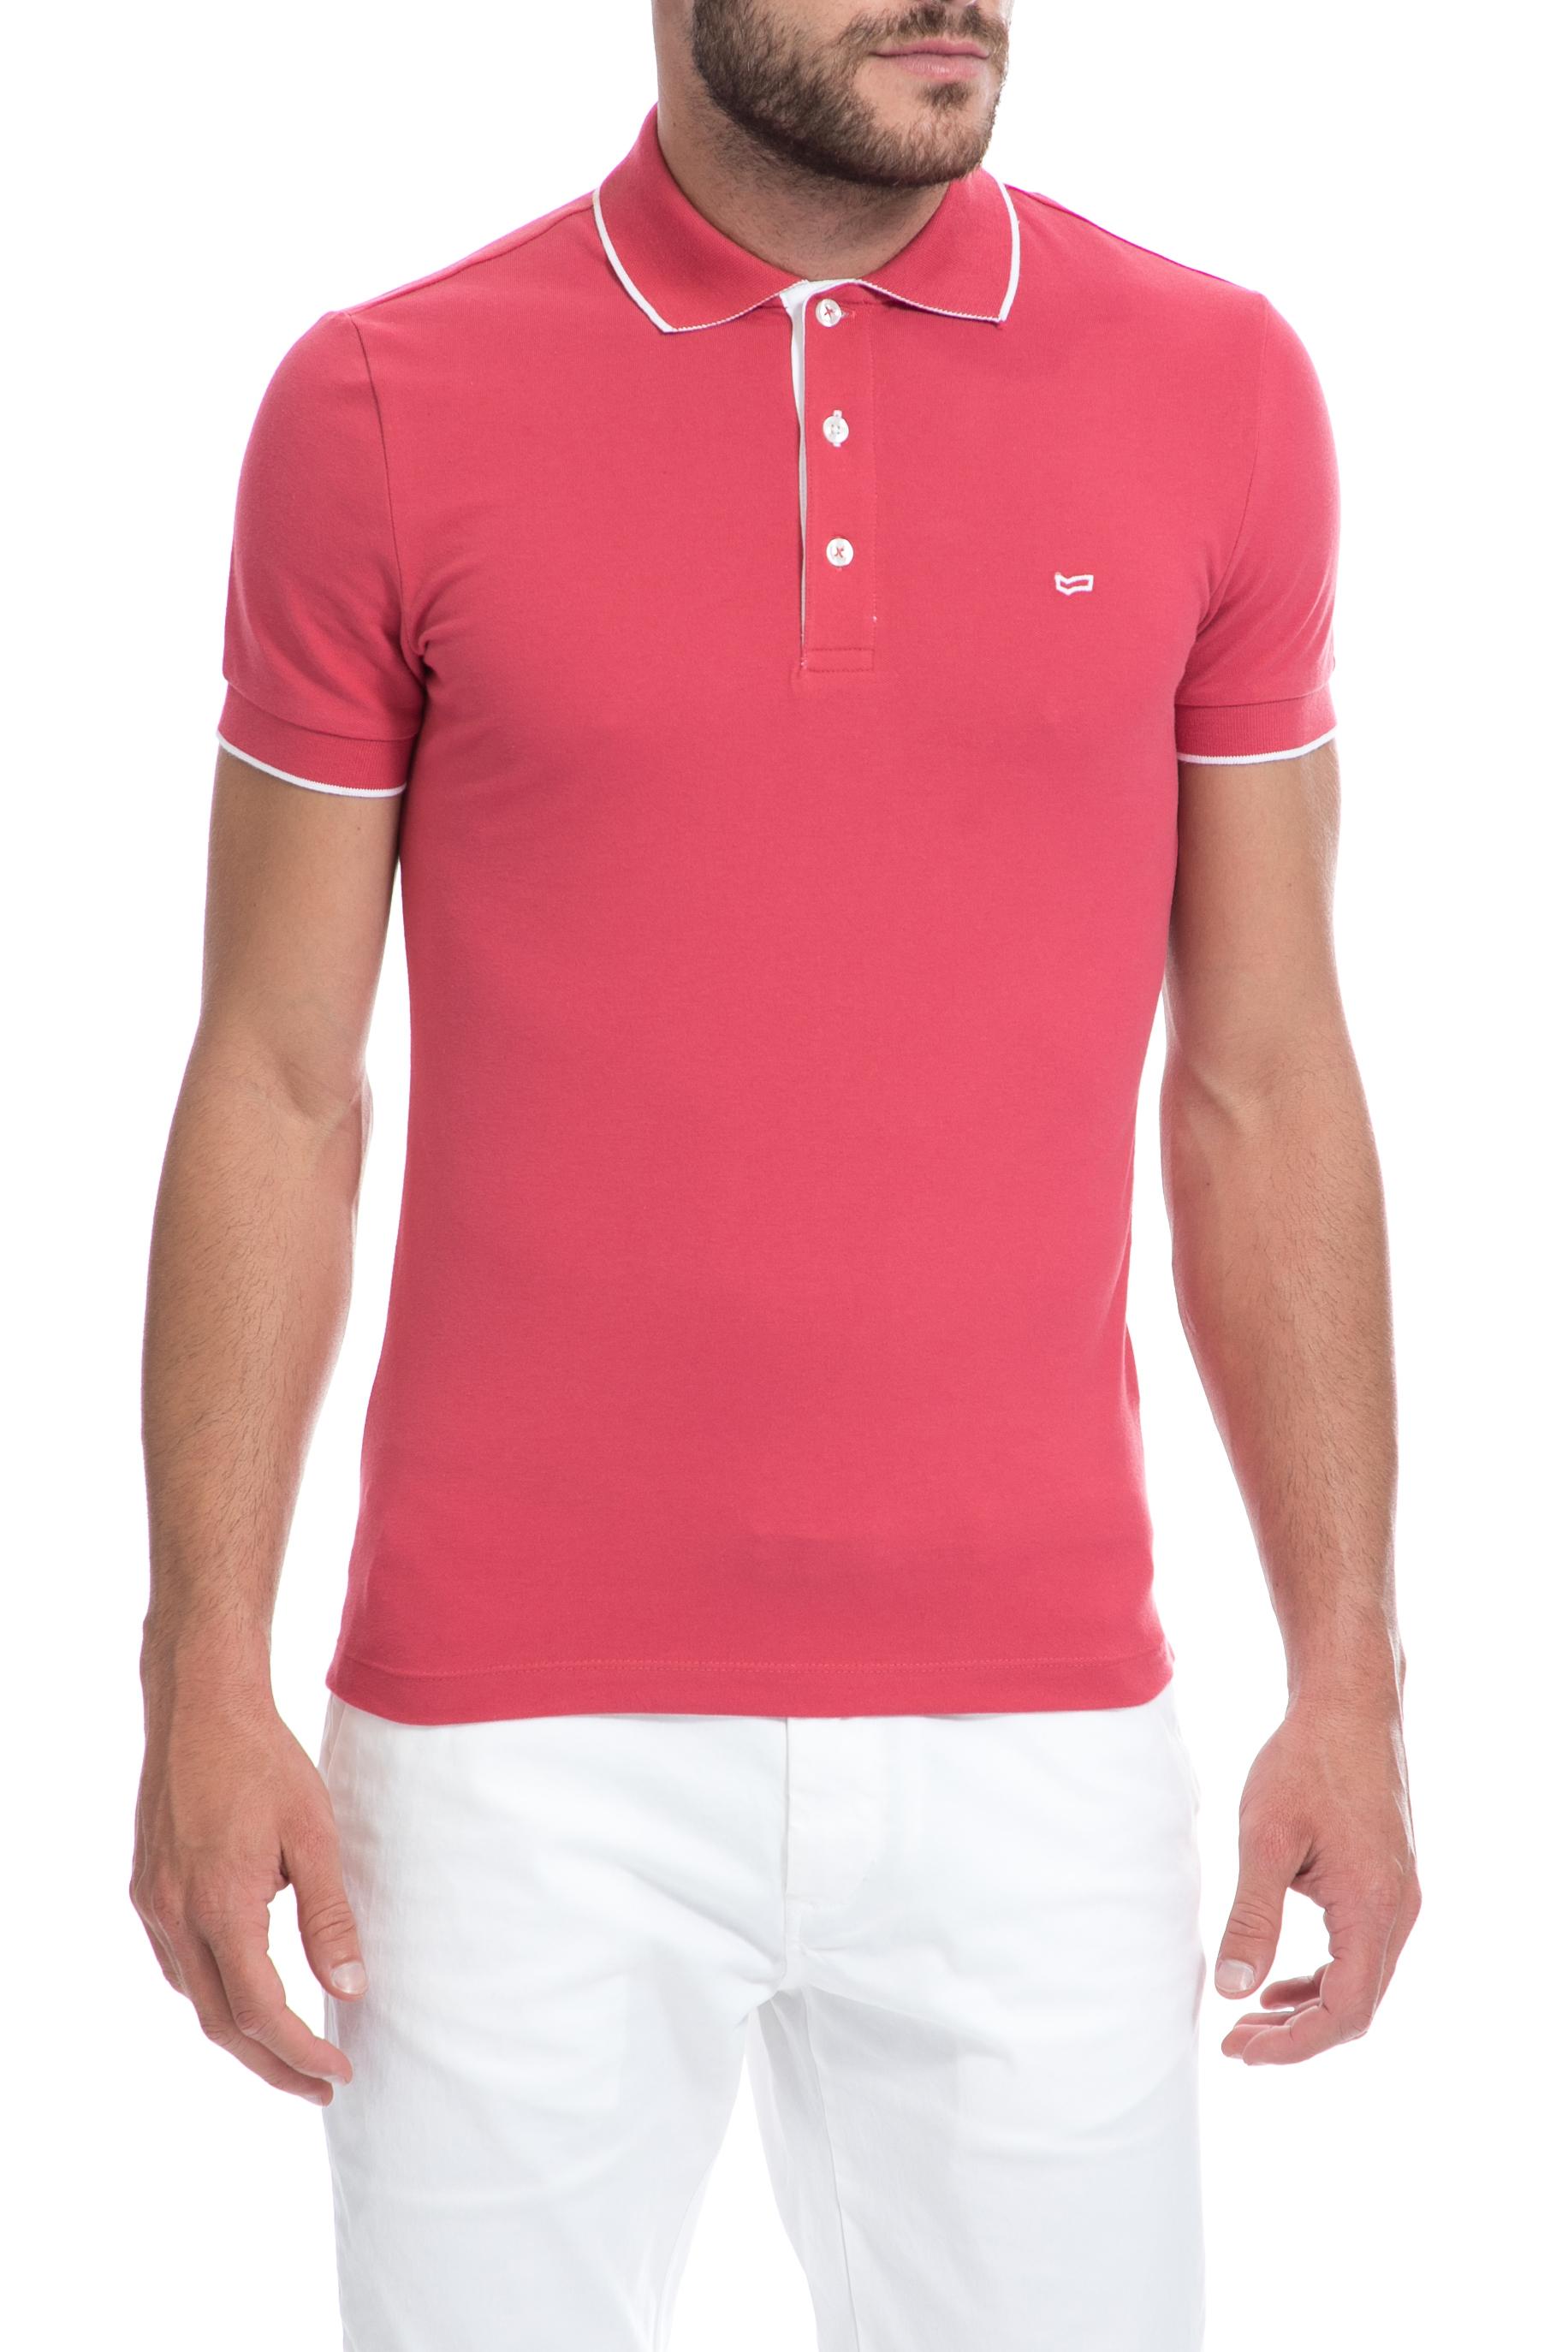 GAS - Ανδρική μπλούζα Gas ροζ